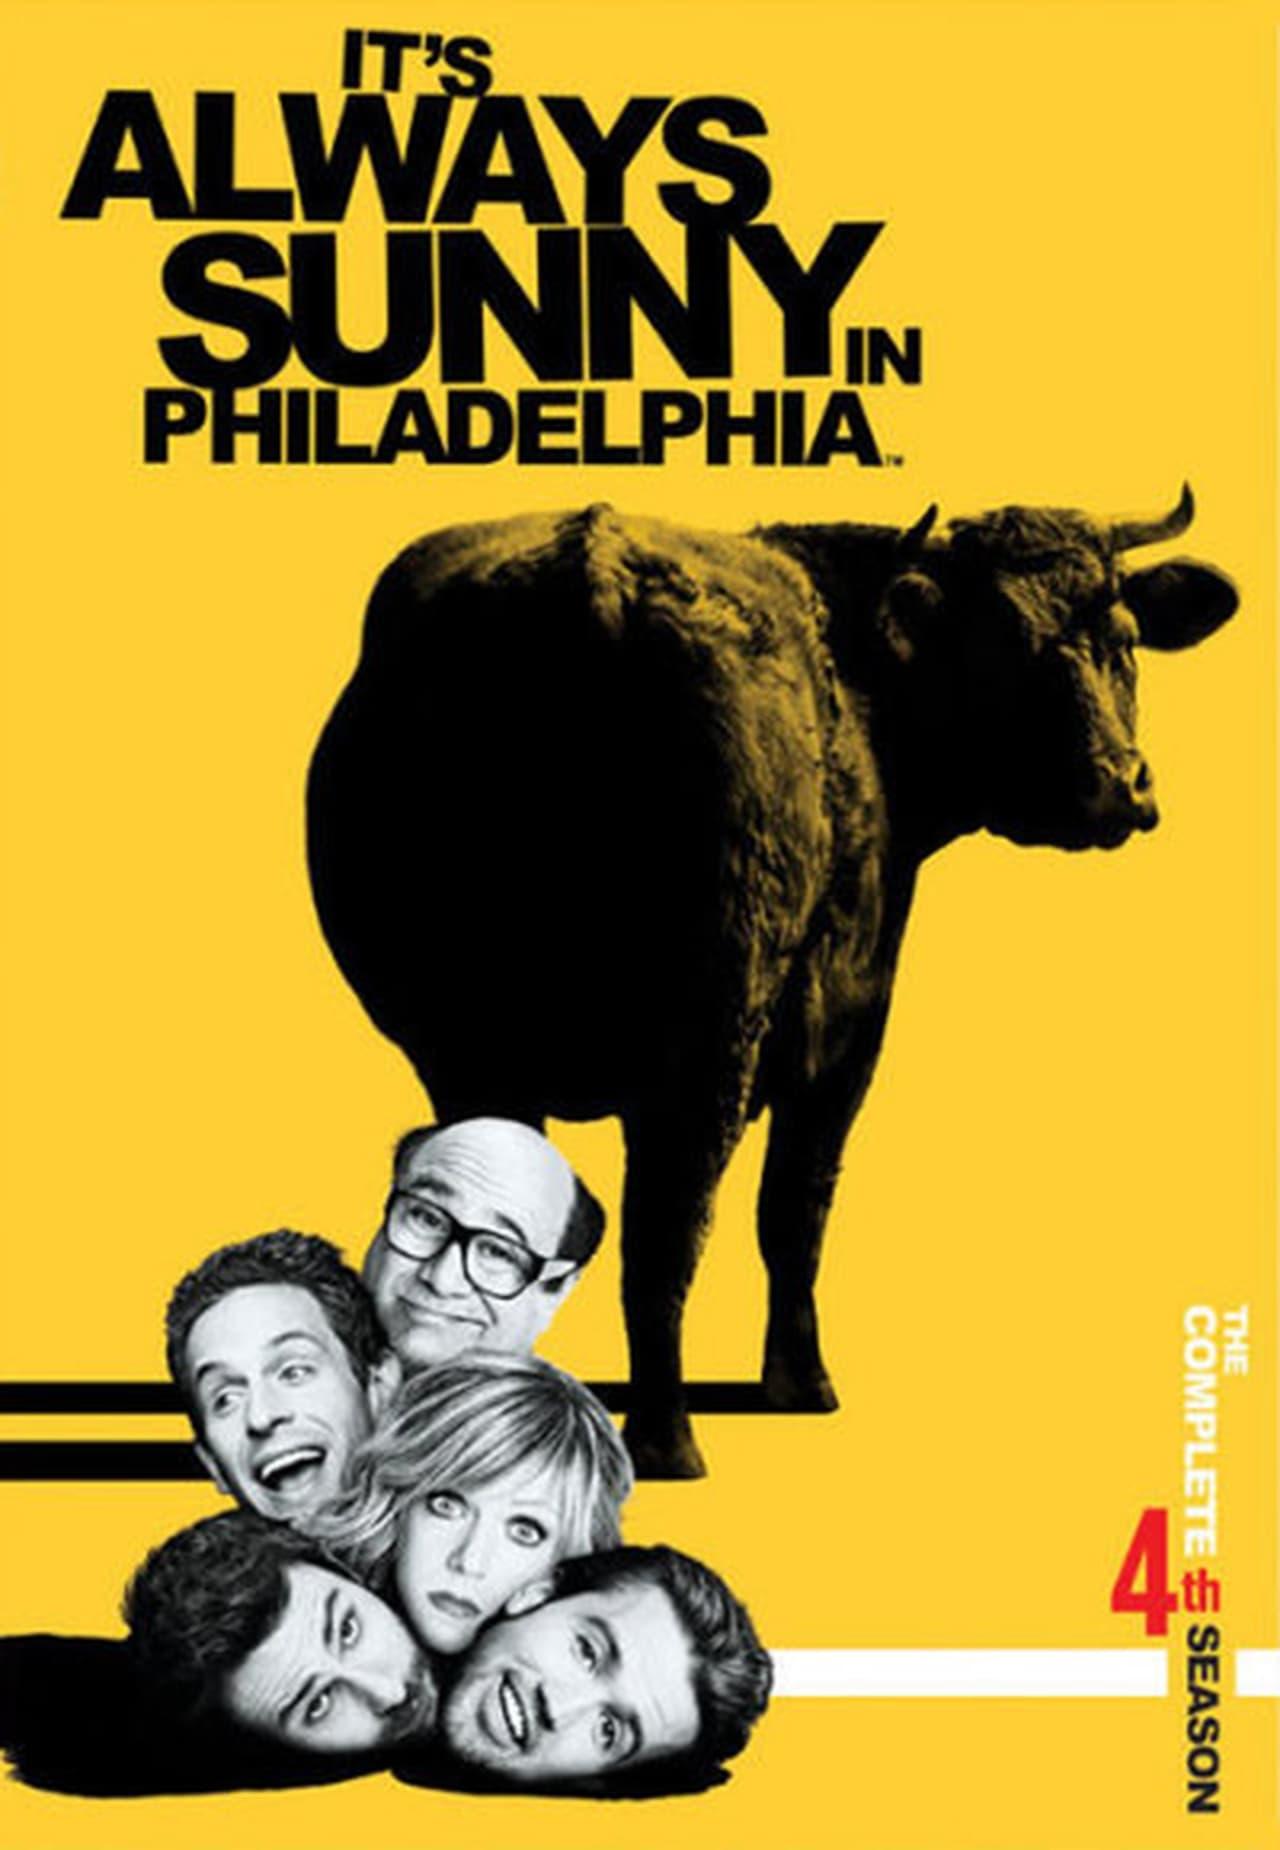 Putlocker It's Always Sunny In Philadelphia Season 4 (2008)